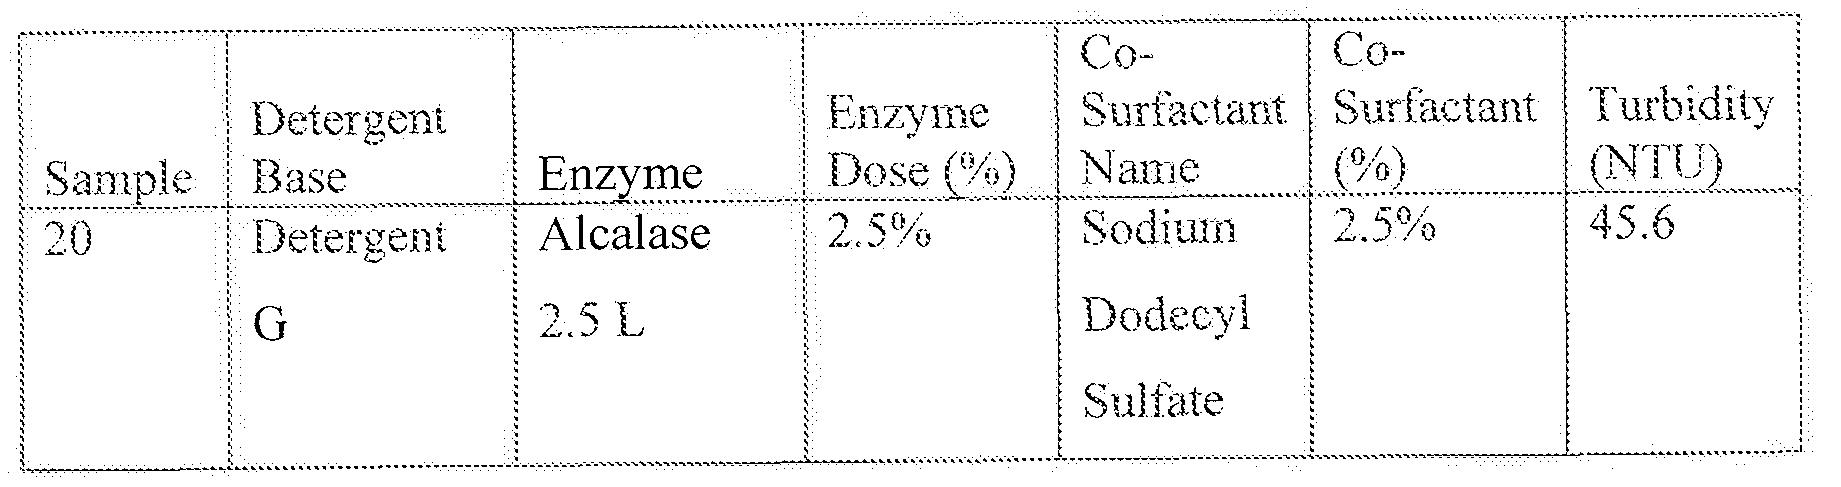 WO2013159032A1 - Liquid detergent compositions - Google Patents